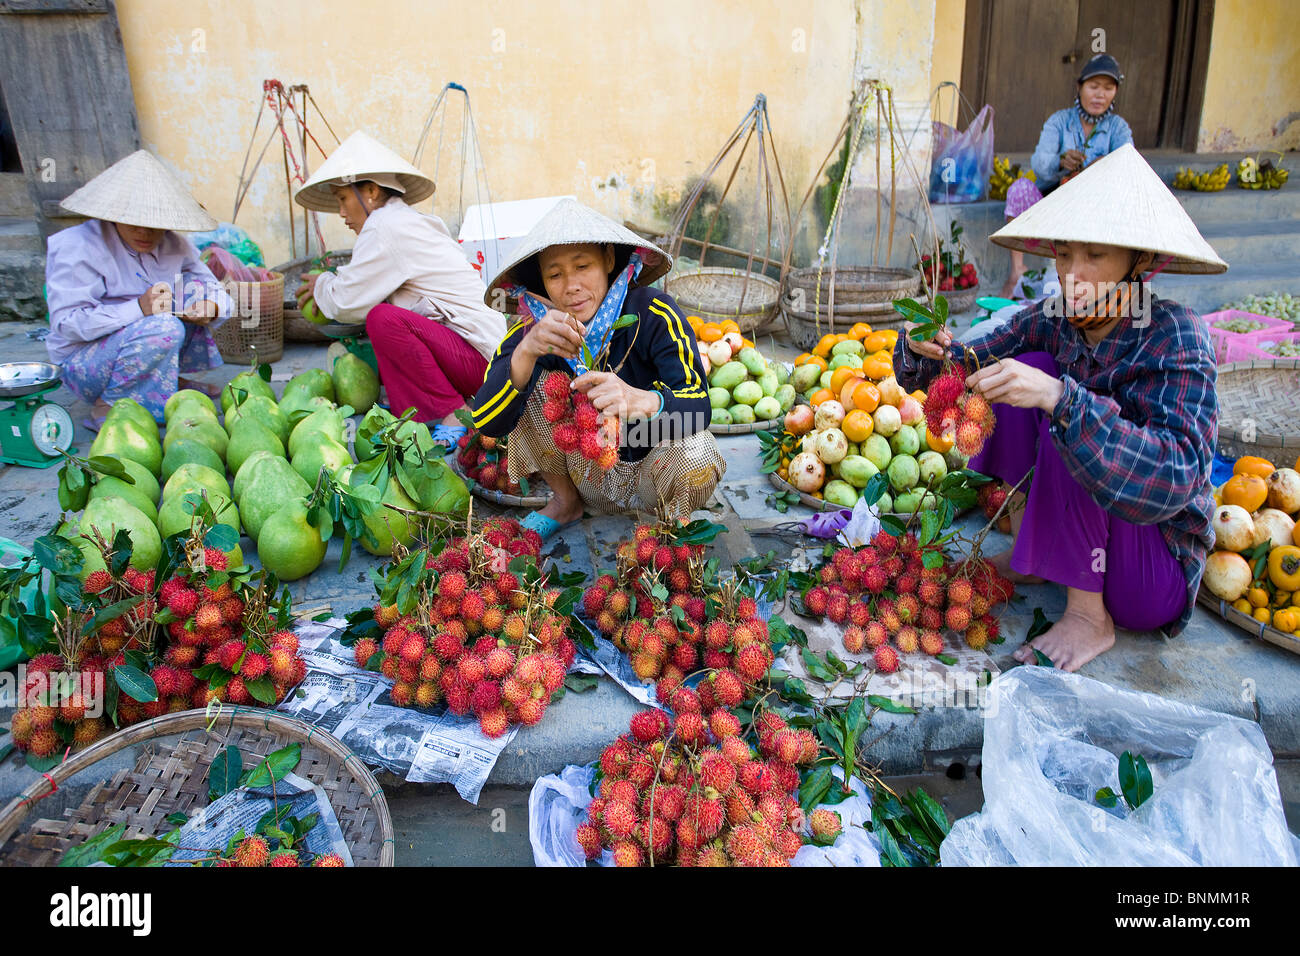 vietnam asia far east hoi an market vegetables market vegetables stock photo vietnam asia far east hoi an market vegetables market vegetables sclerk trade commerce traveling place of interest landmark